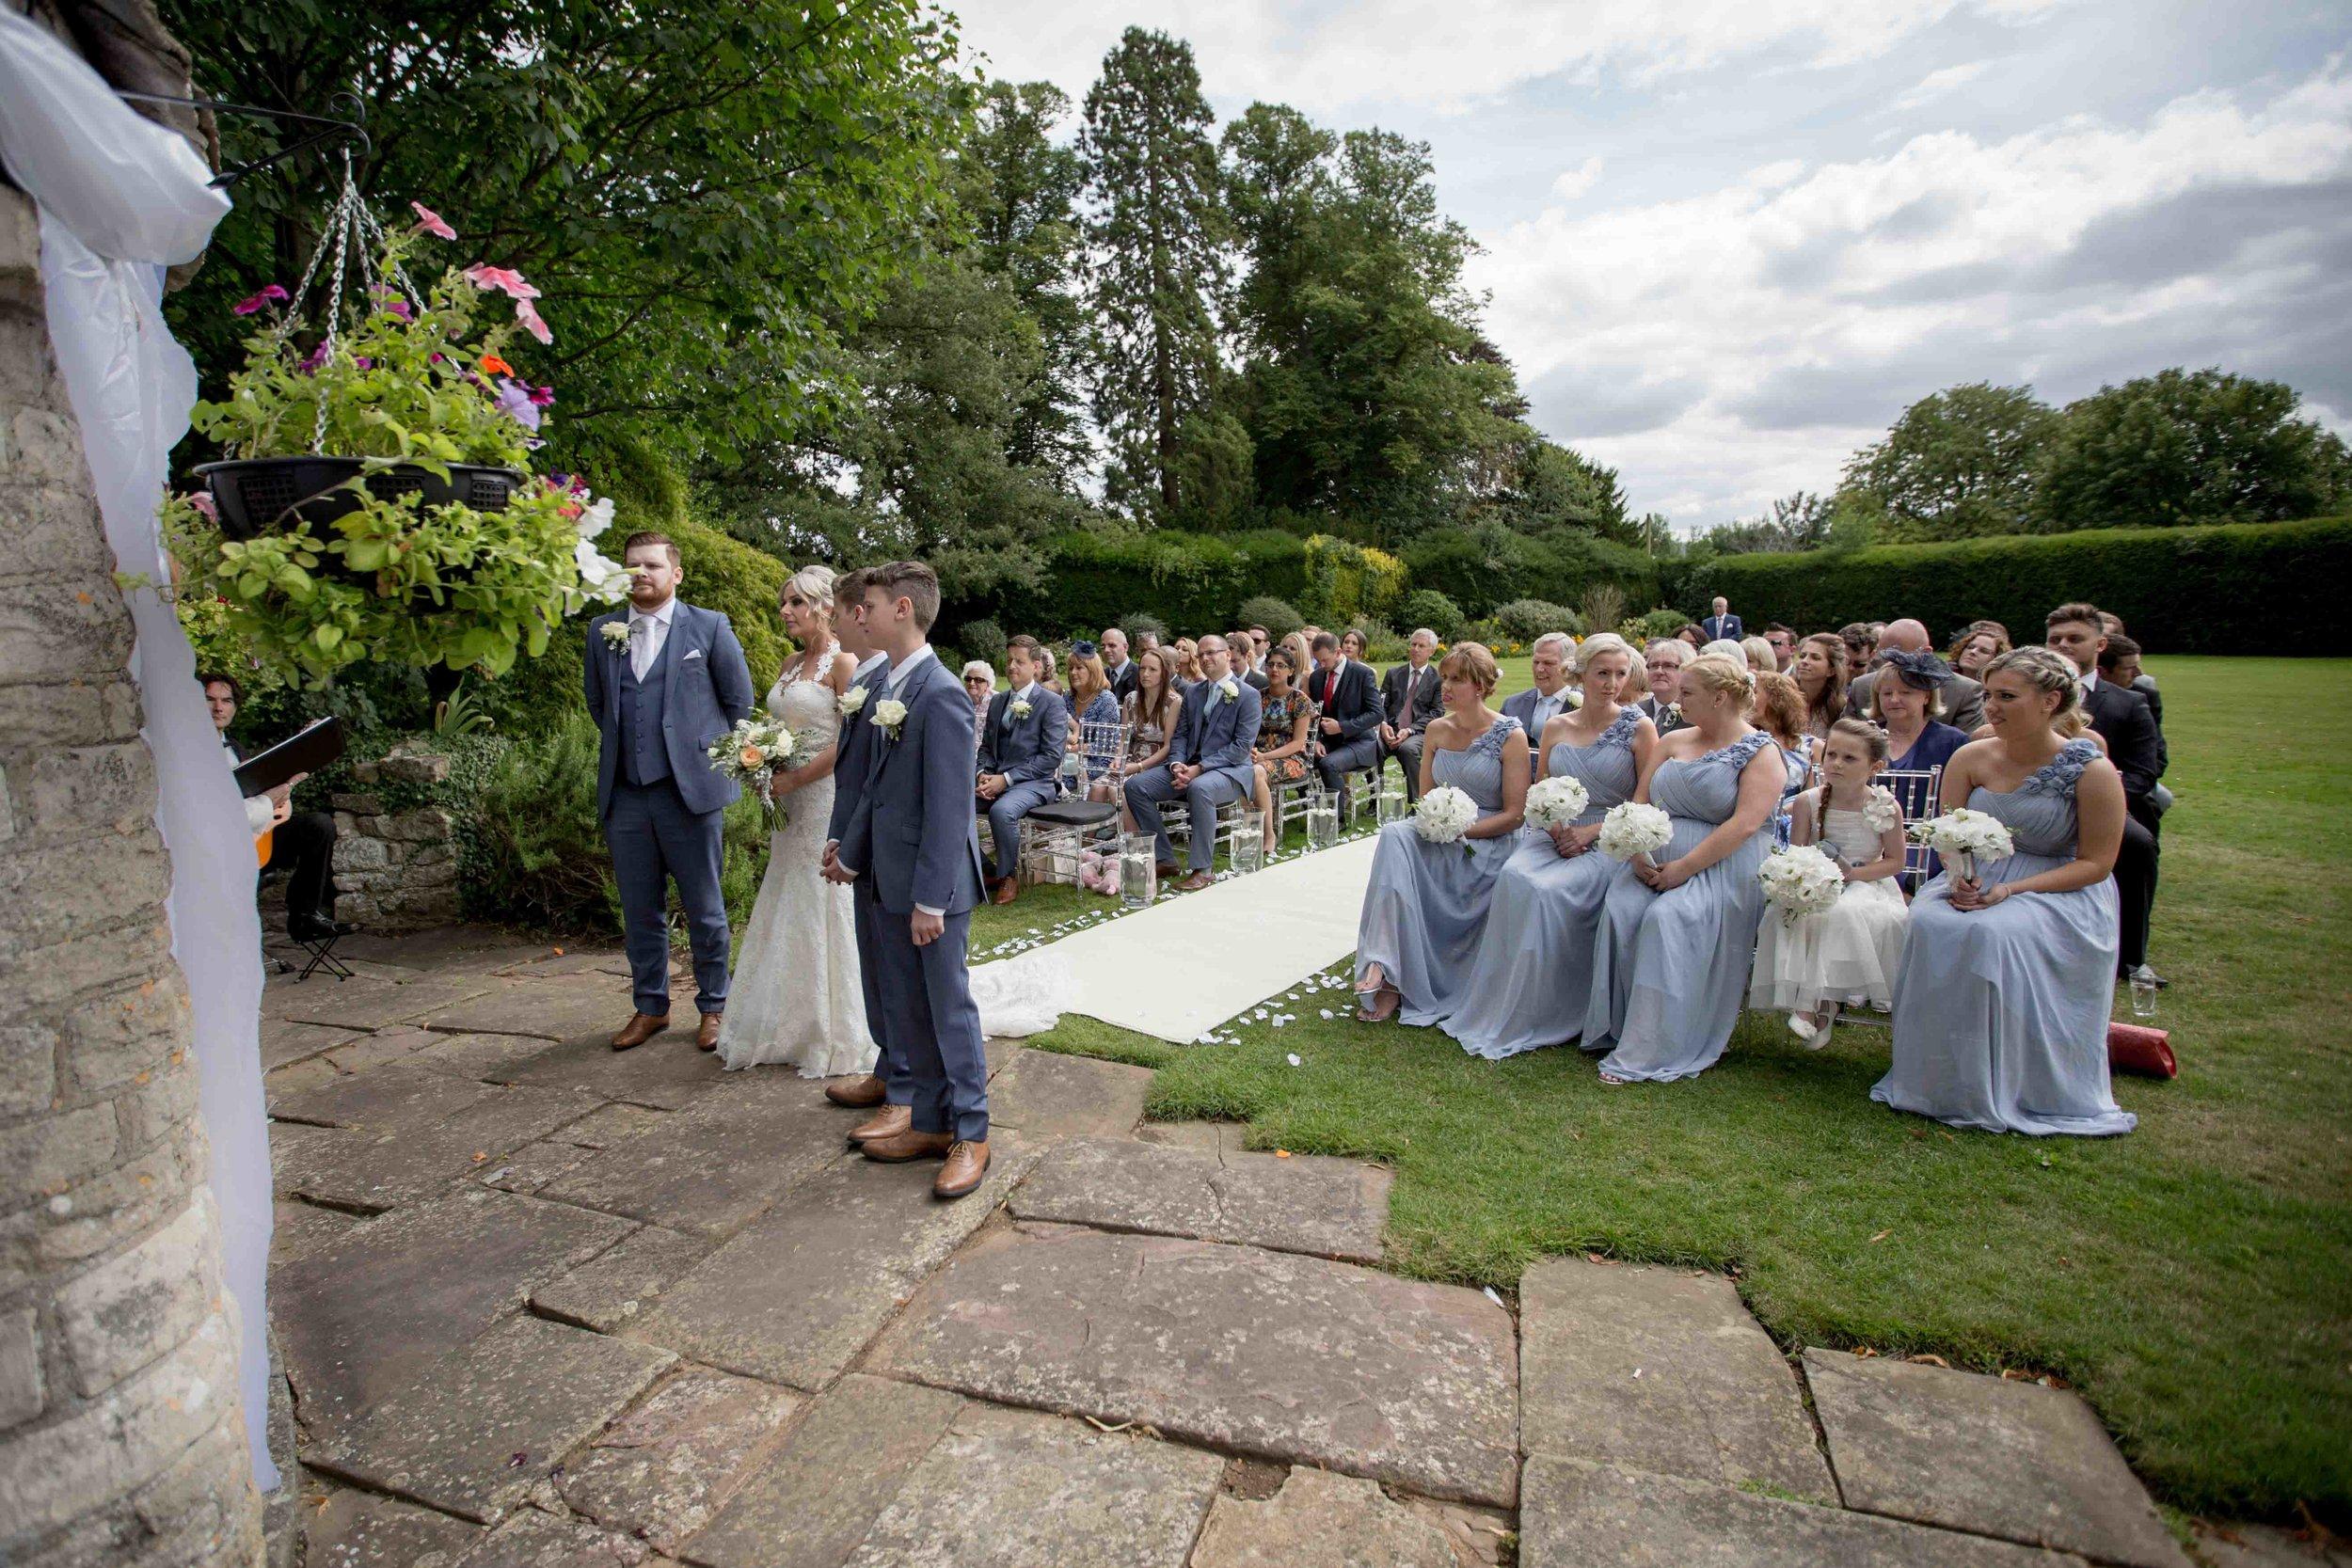 cotswold-wedding-photography-at-stonehouse-court-hotel-natalia-smith-photography-gloucestershire-wedding-photographer-34.jpg